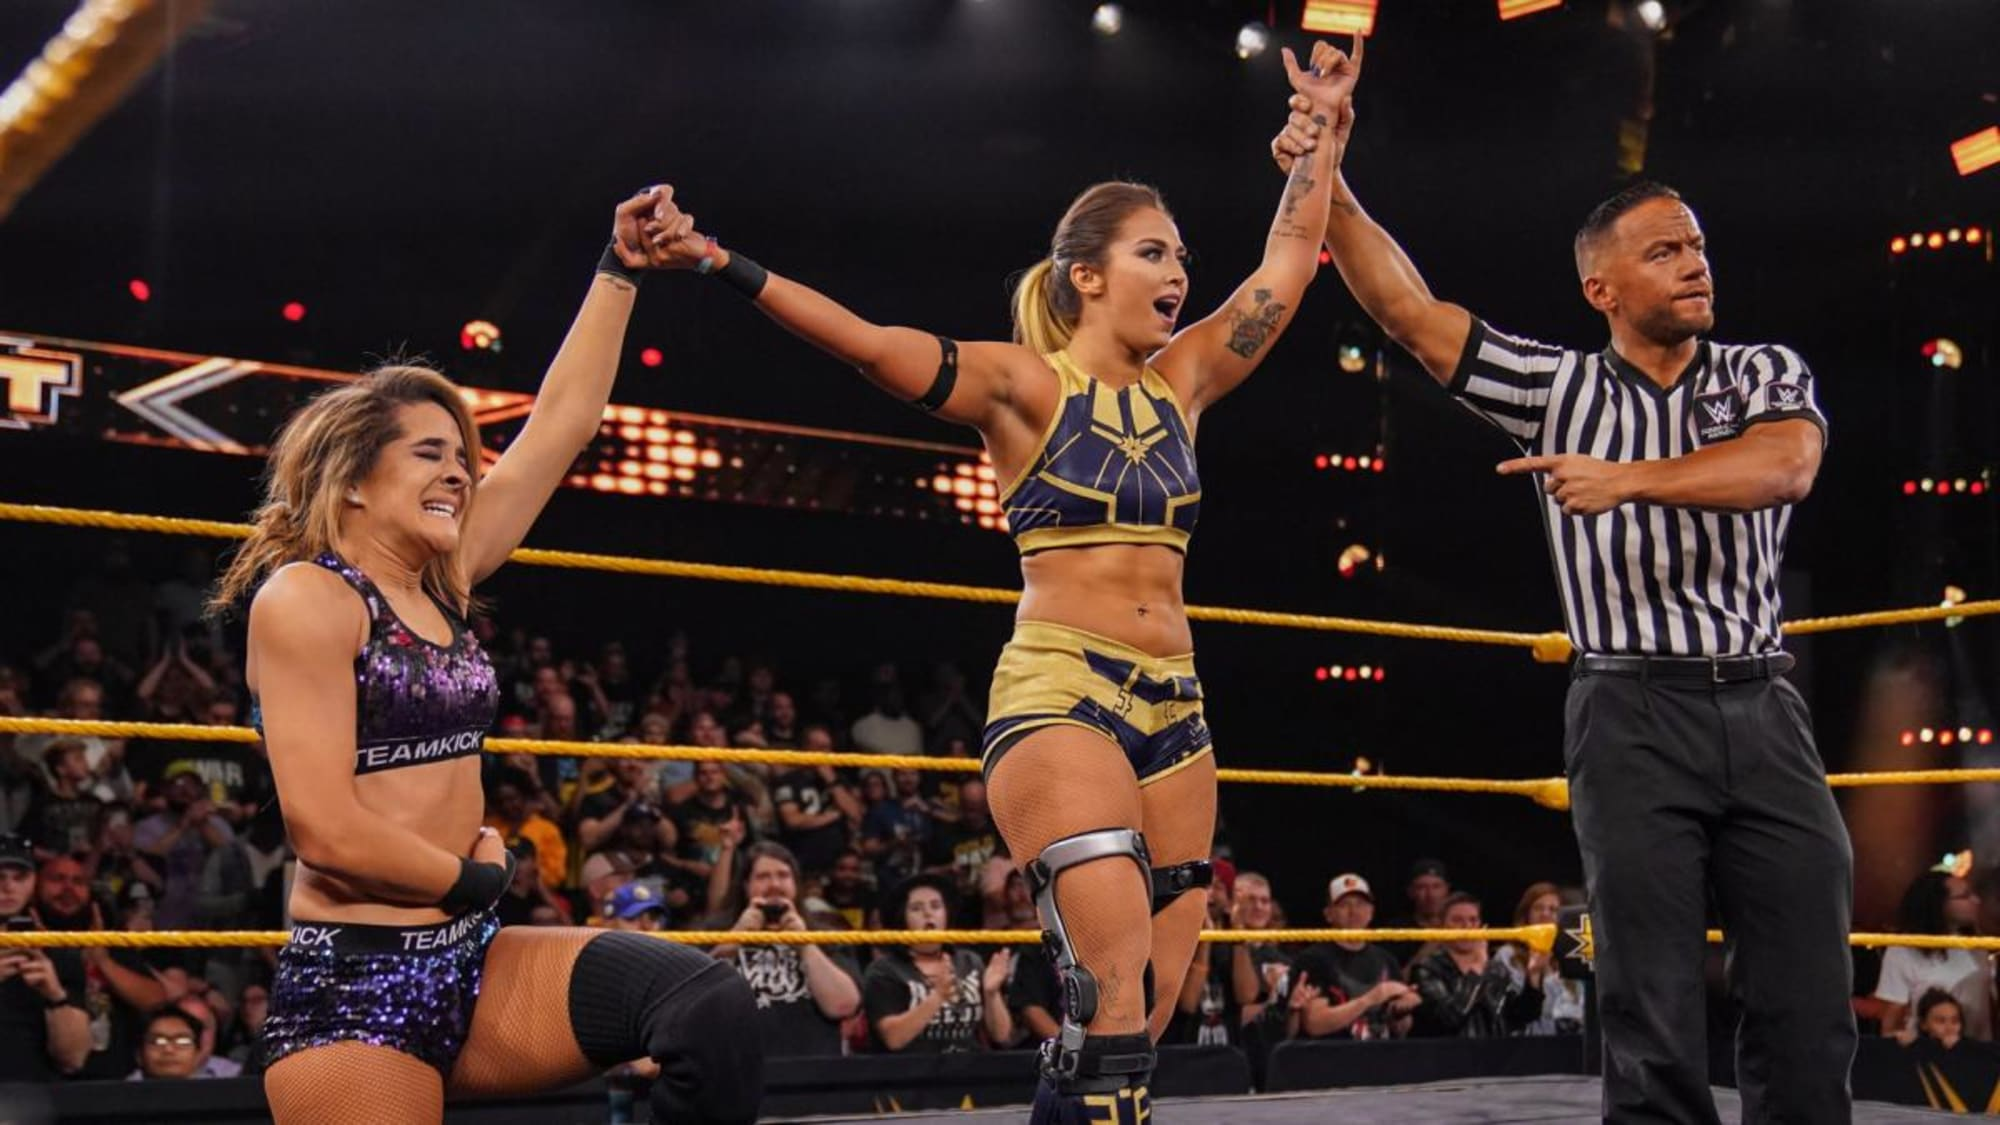 WWE NXT: Io Shirai defeats Tegan Nox in main event